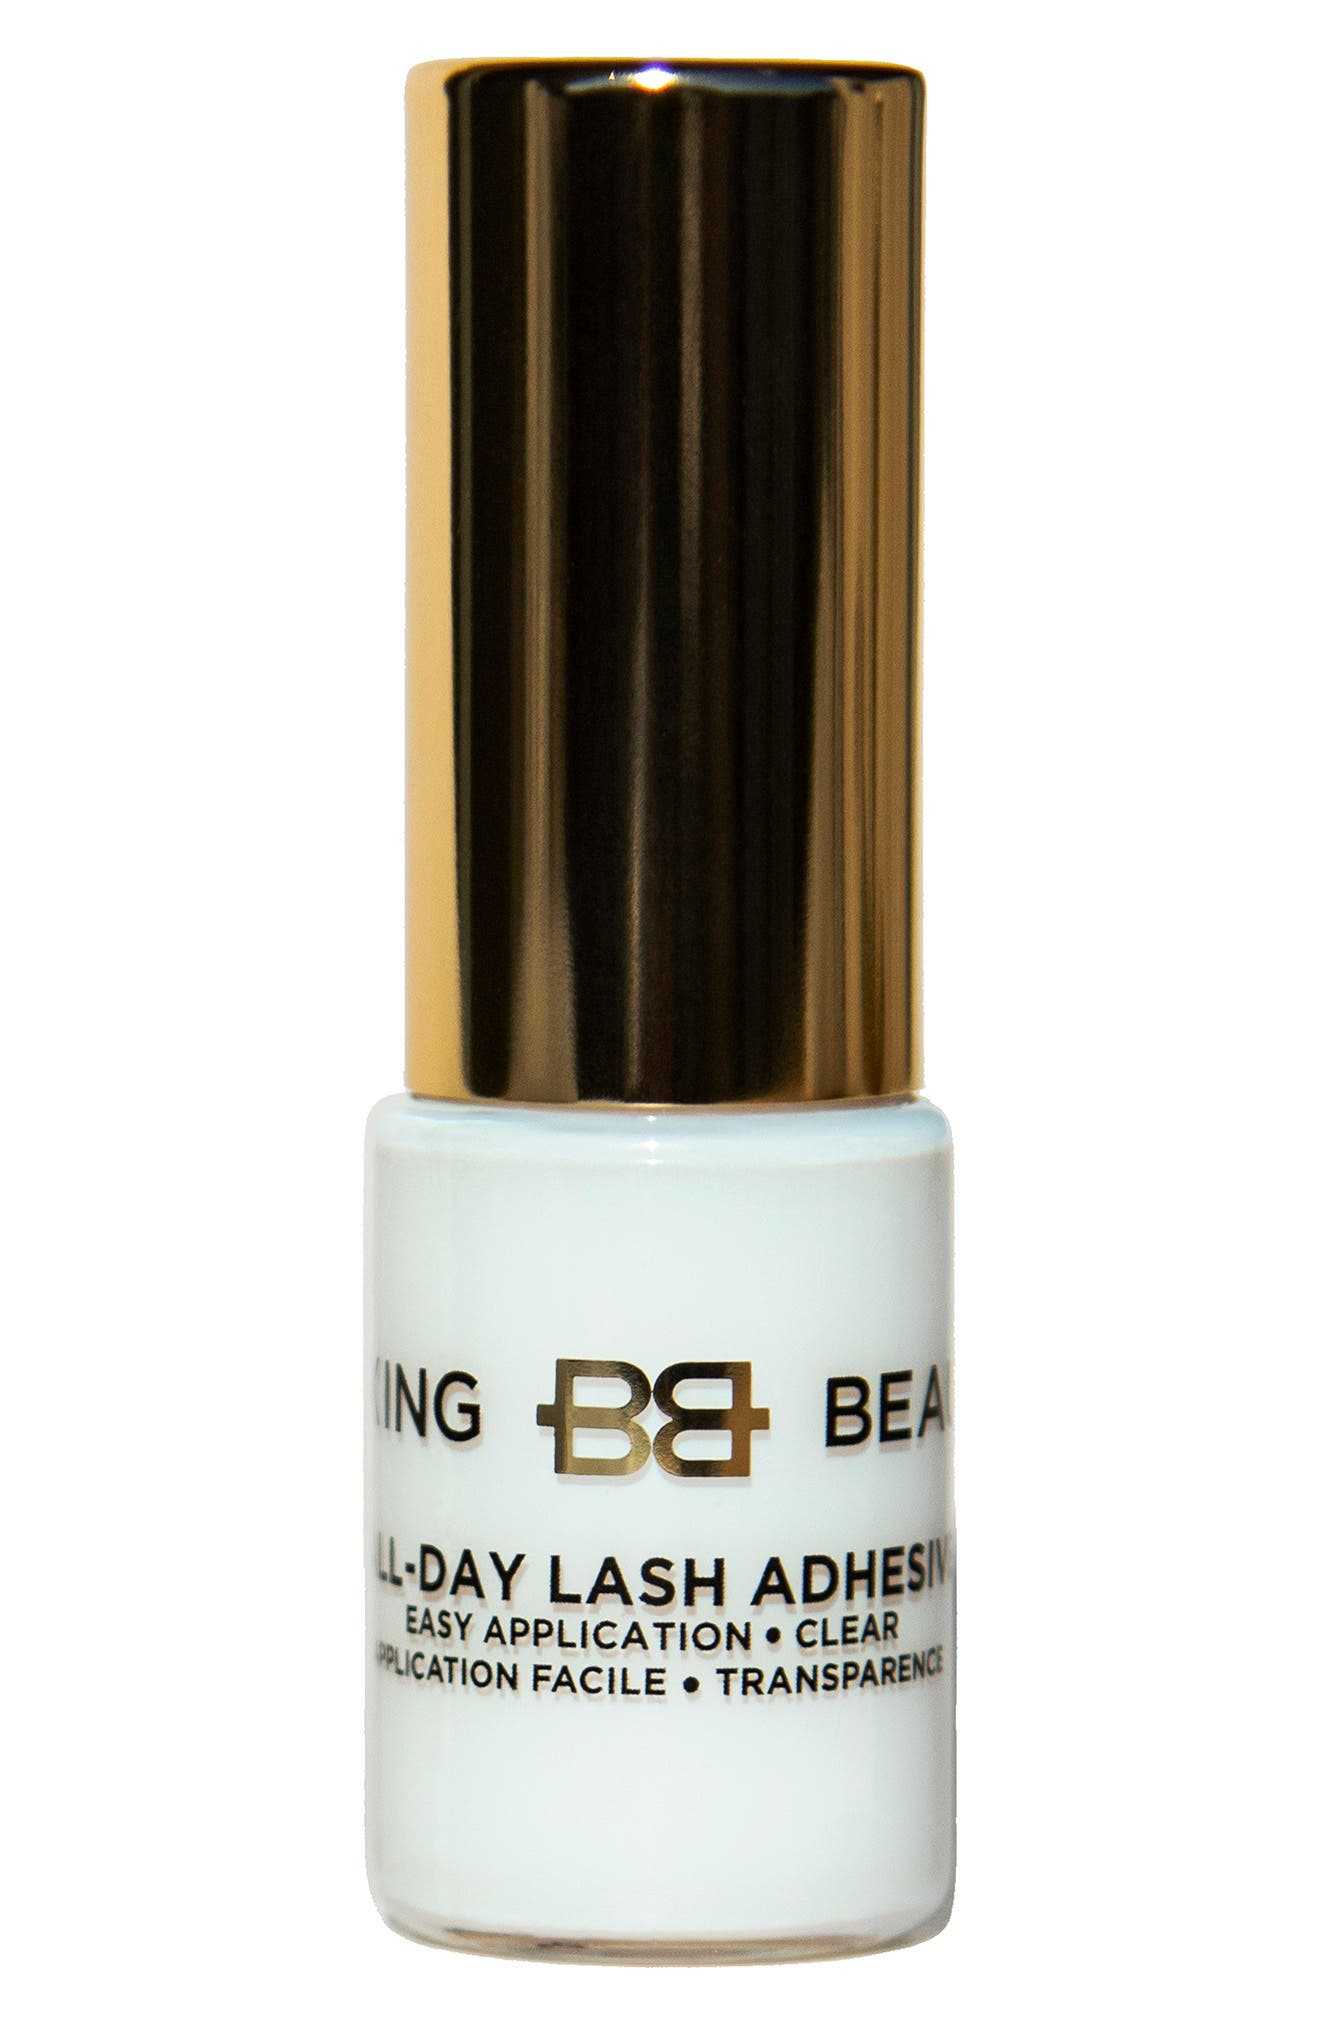 All-Day Lash Adhesive